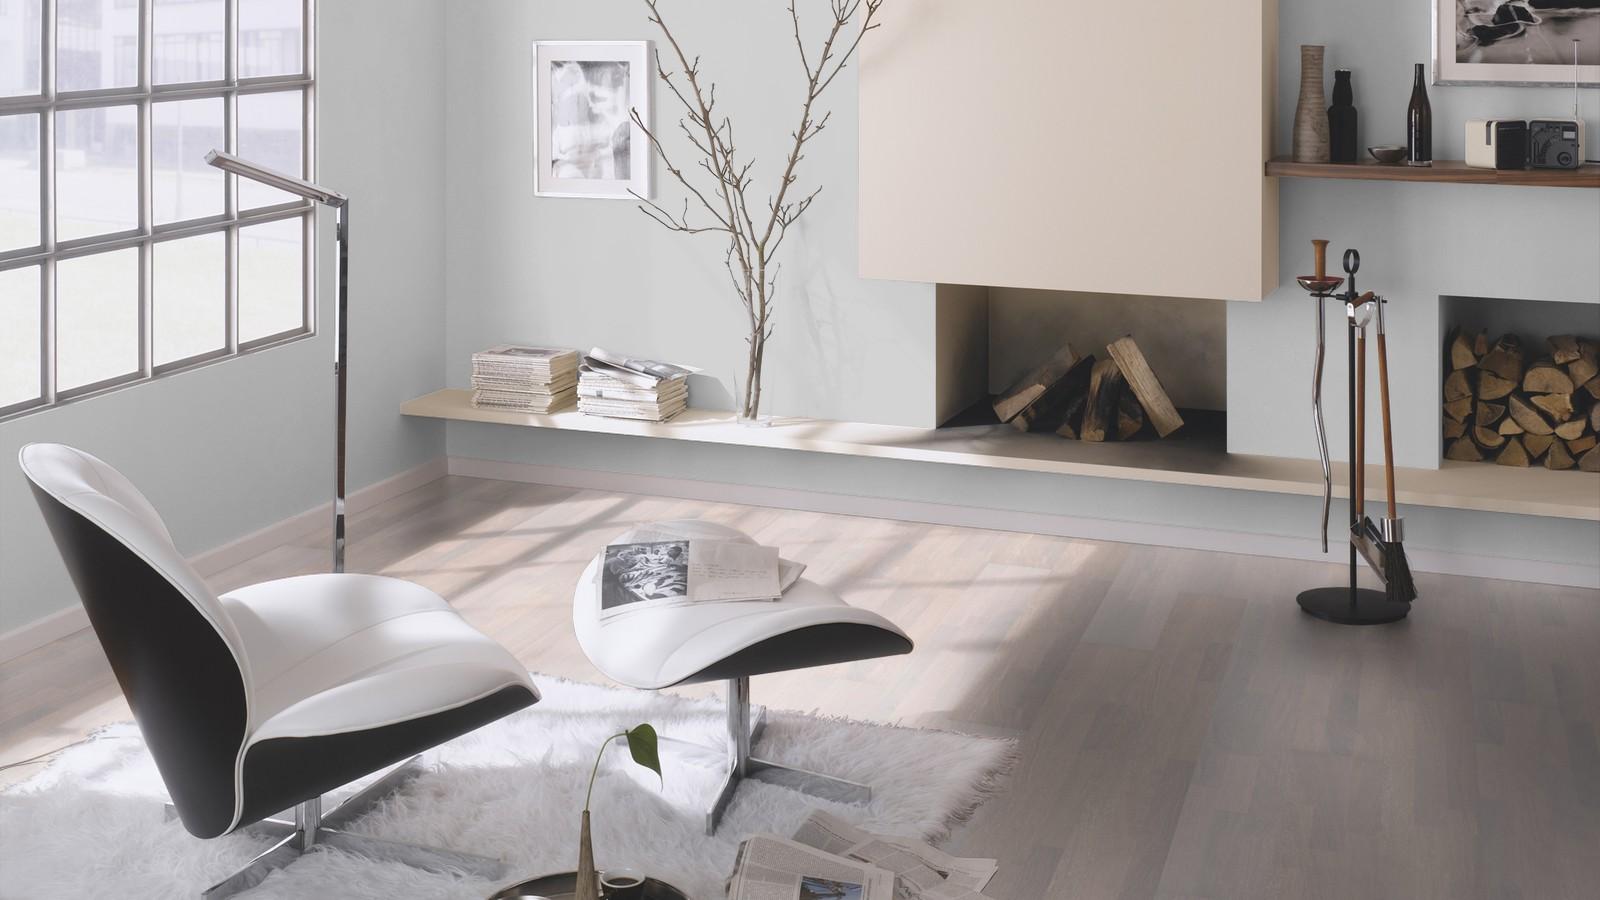 ter h rne pure collection l parkett l a15 eiche altwei l schiffsboden preisbrecher 24 gmbh. Black Bedroom Furniture Sets. Home Design Ideas